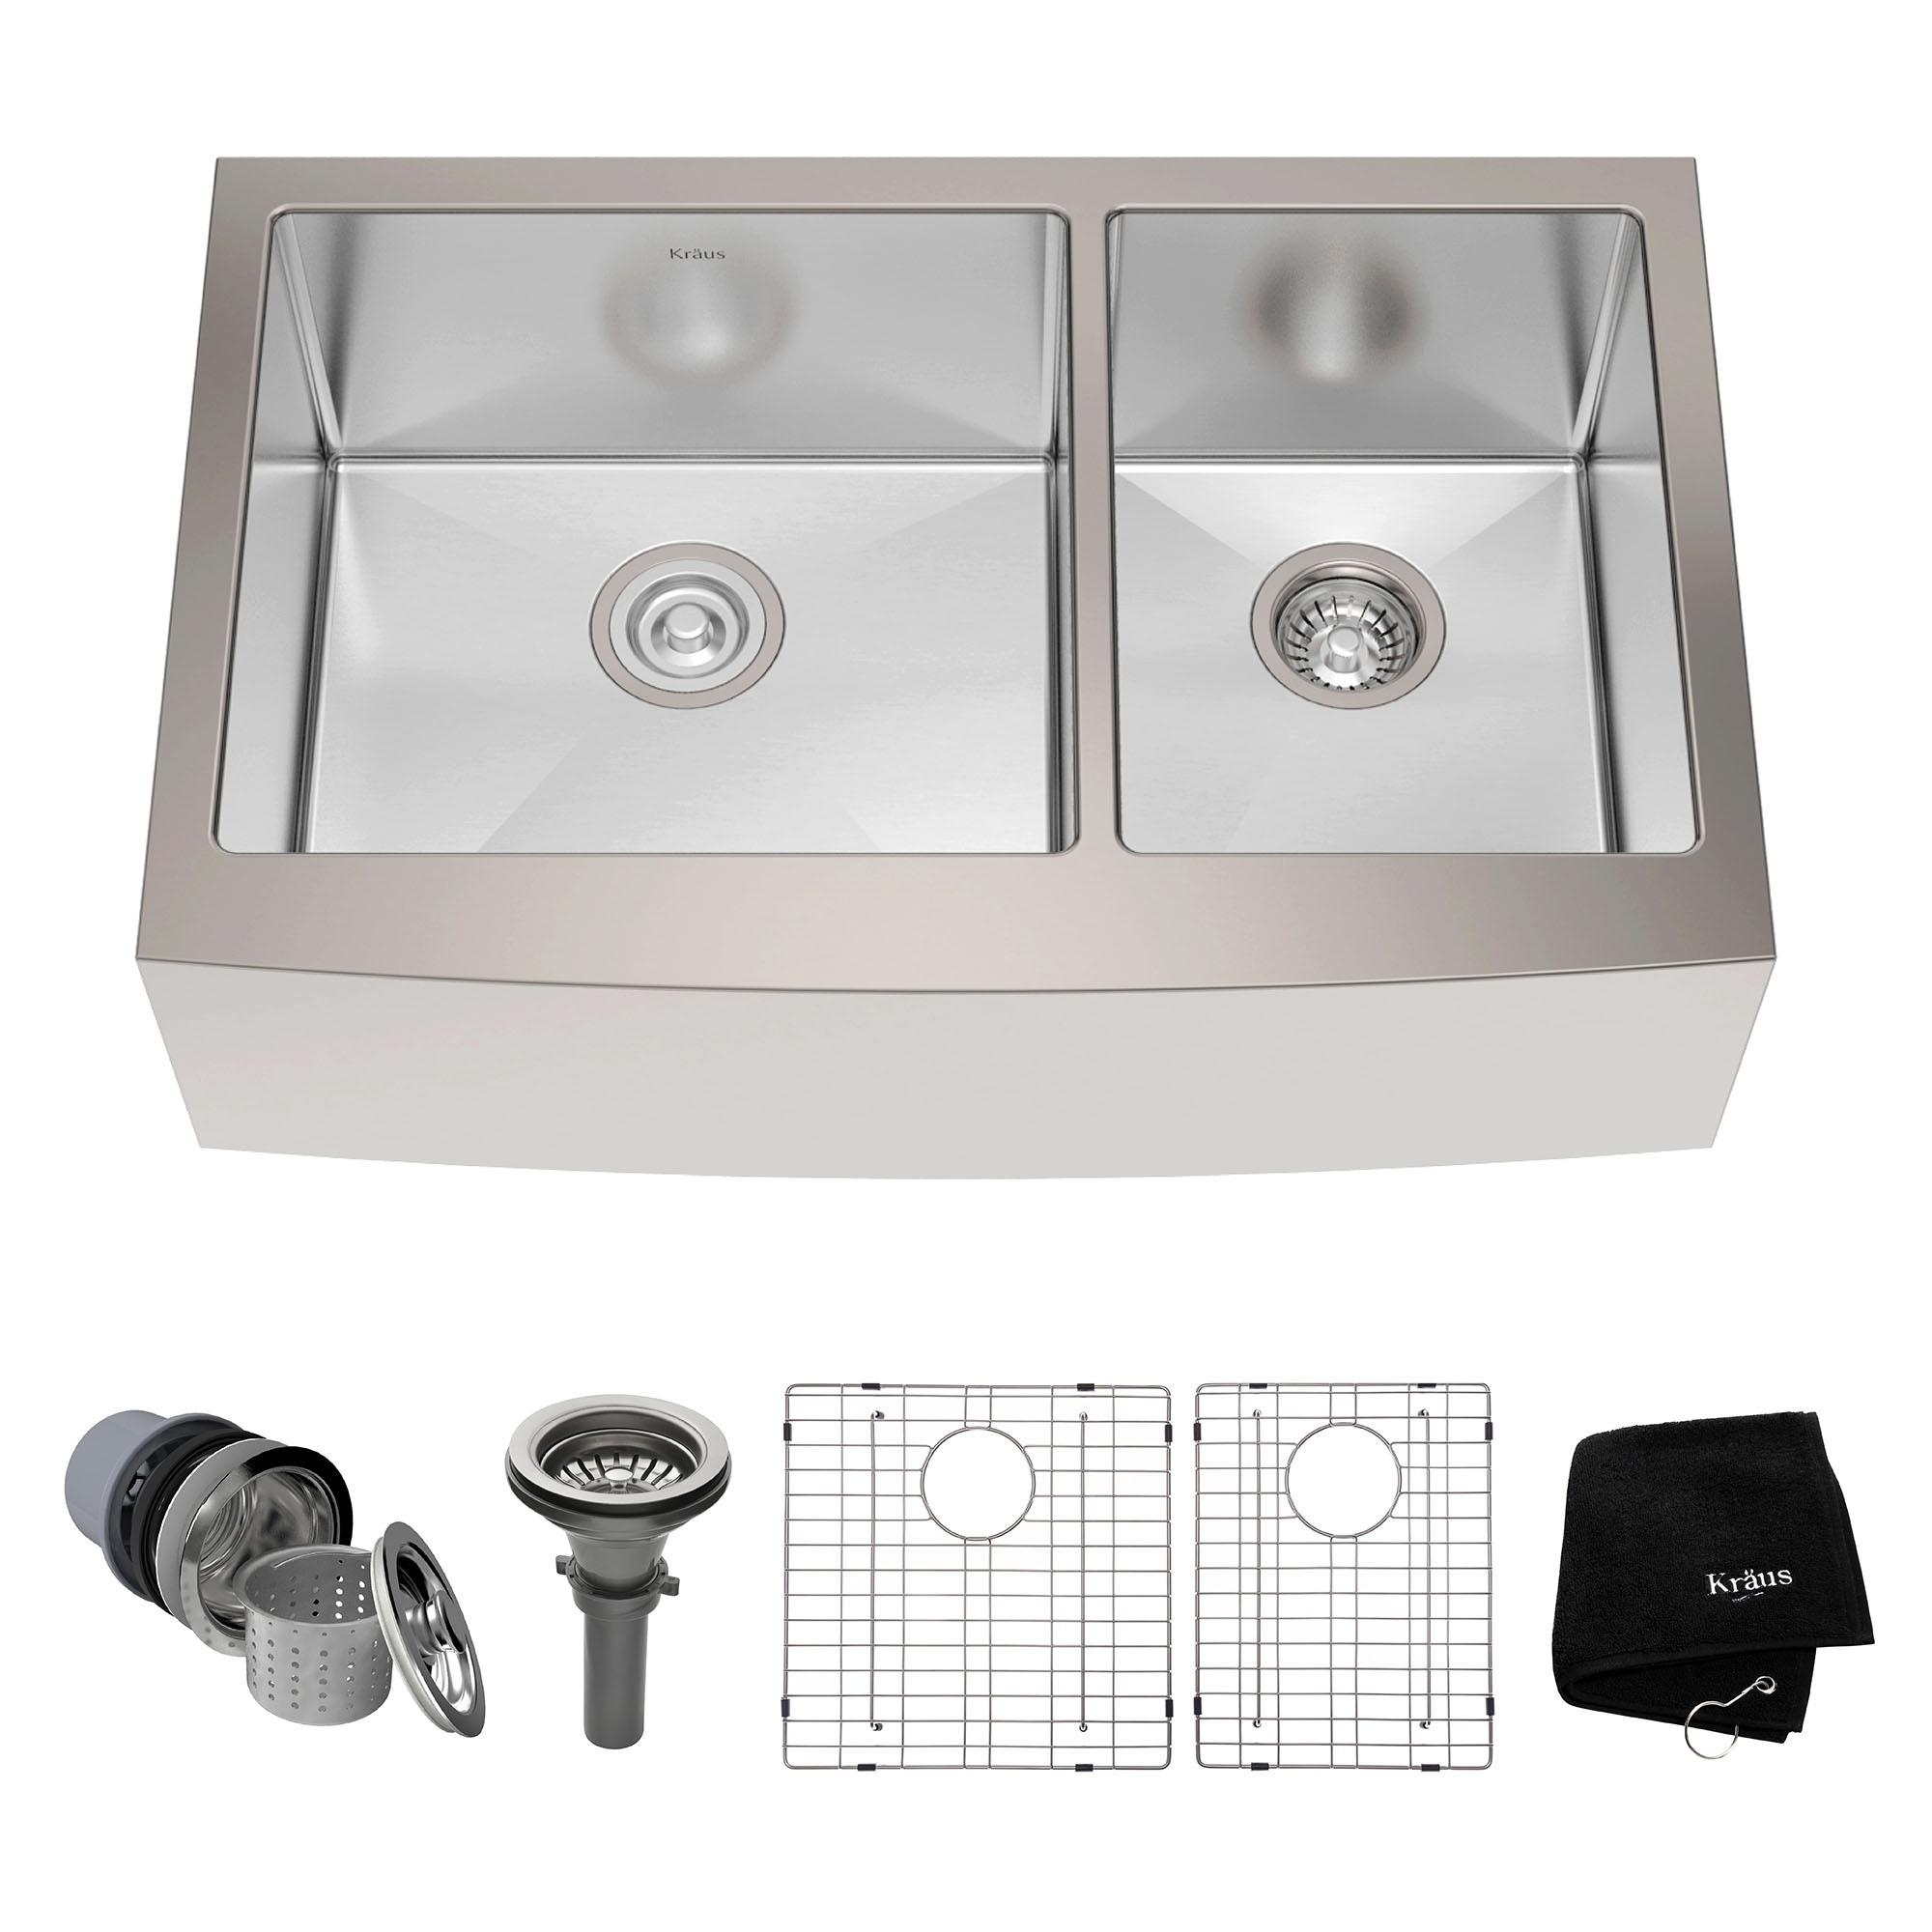 KRAUS 33 Inch Farmhouse Double Bowl Stainless Steel Kitchen Sink ...